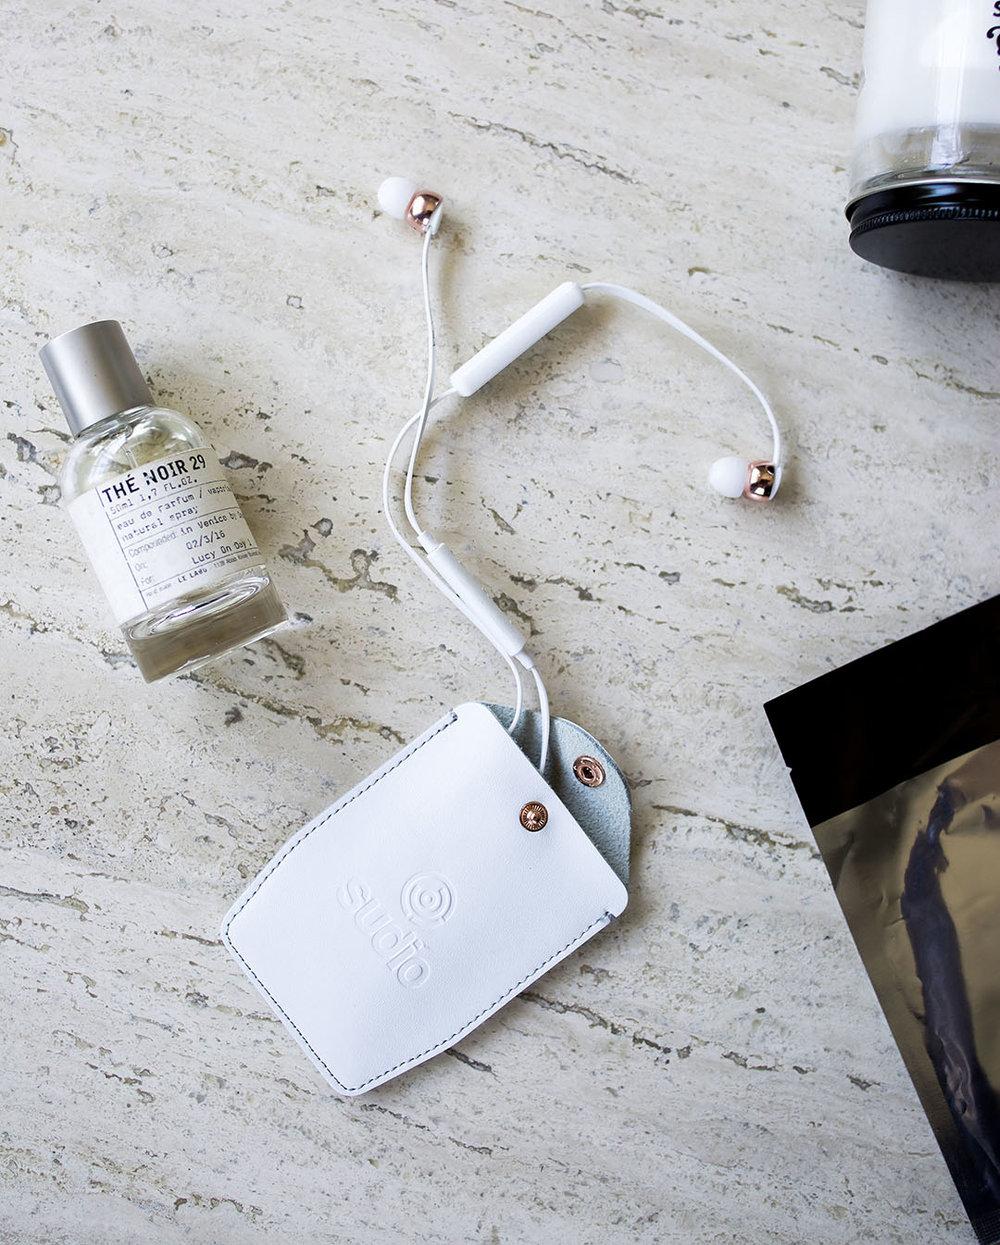 Sudio-Wireless-Headphones-Luxury-Travel-Essentials.jpg